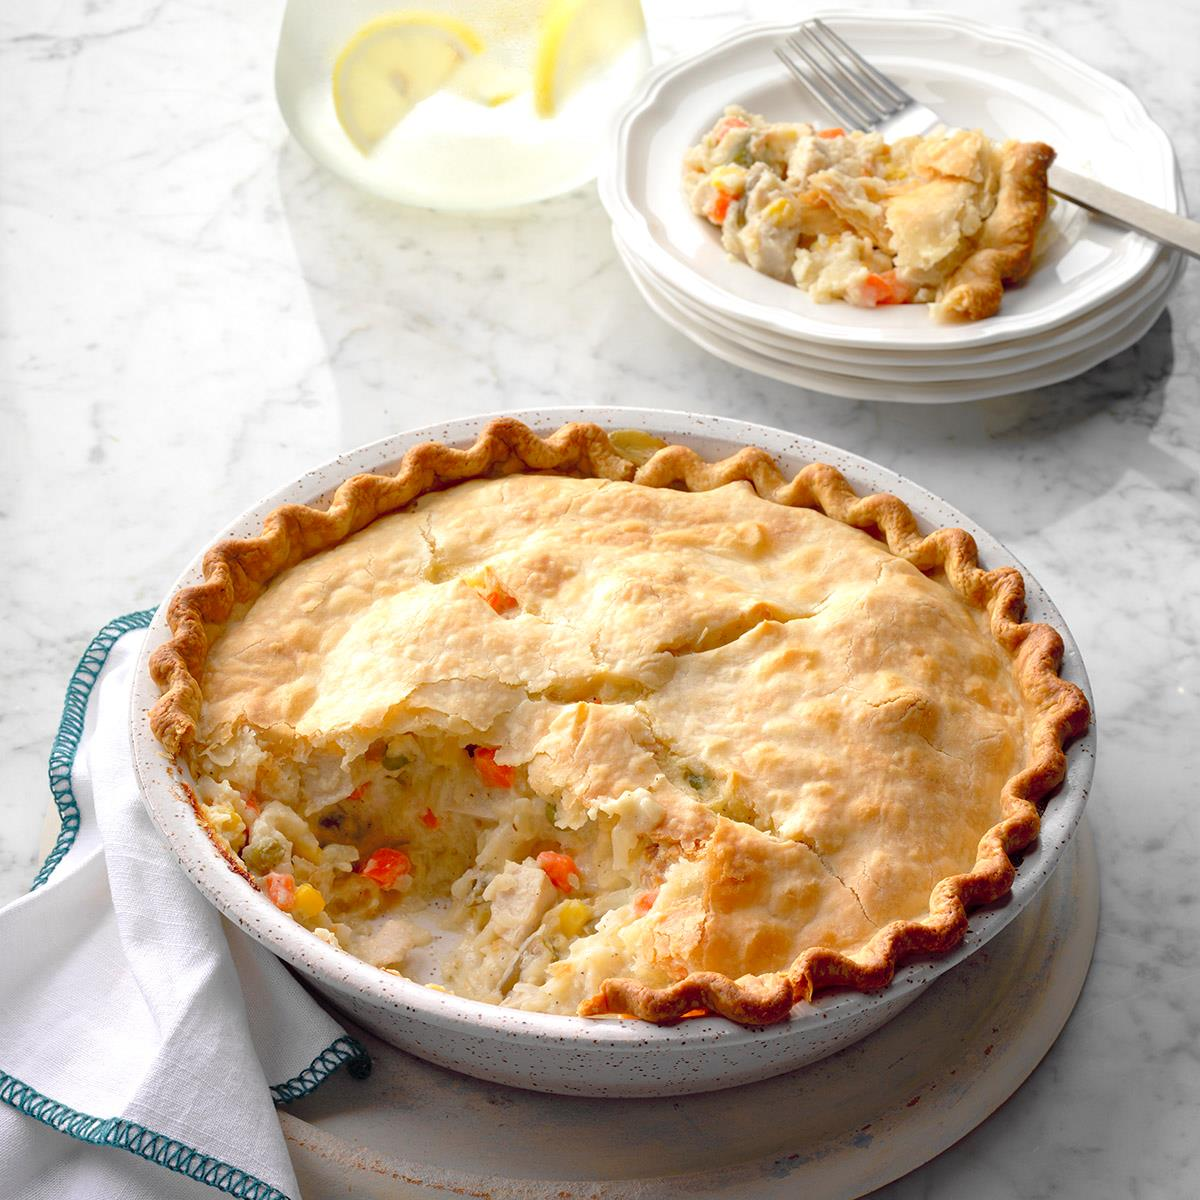 Golden chicken potpie recipe taste of home for Good quiche recipes easy